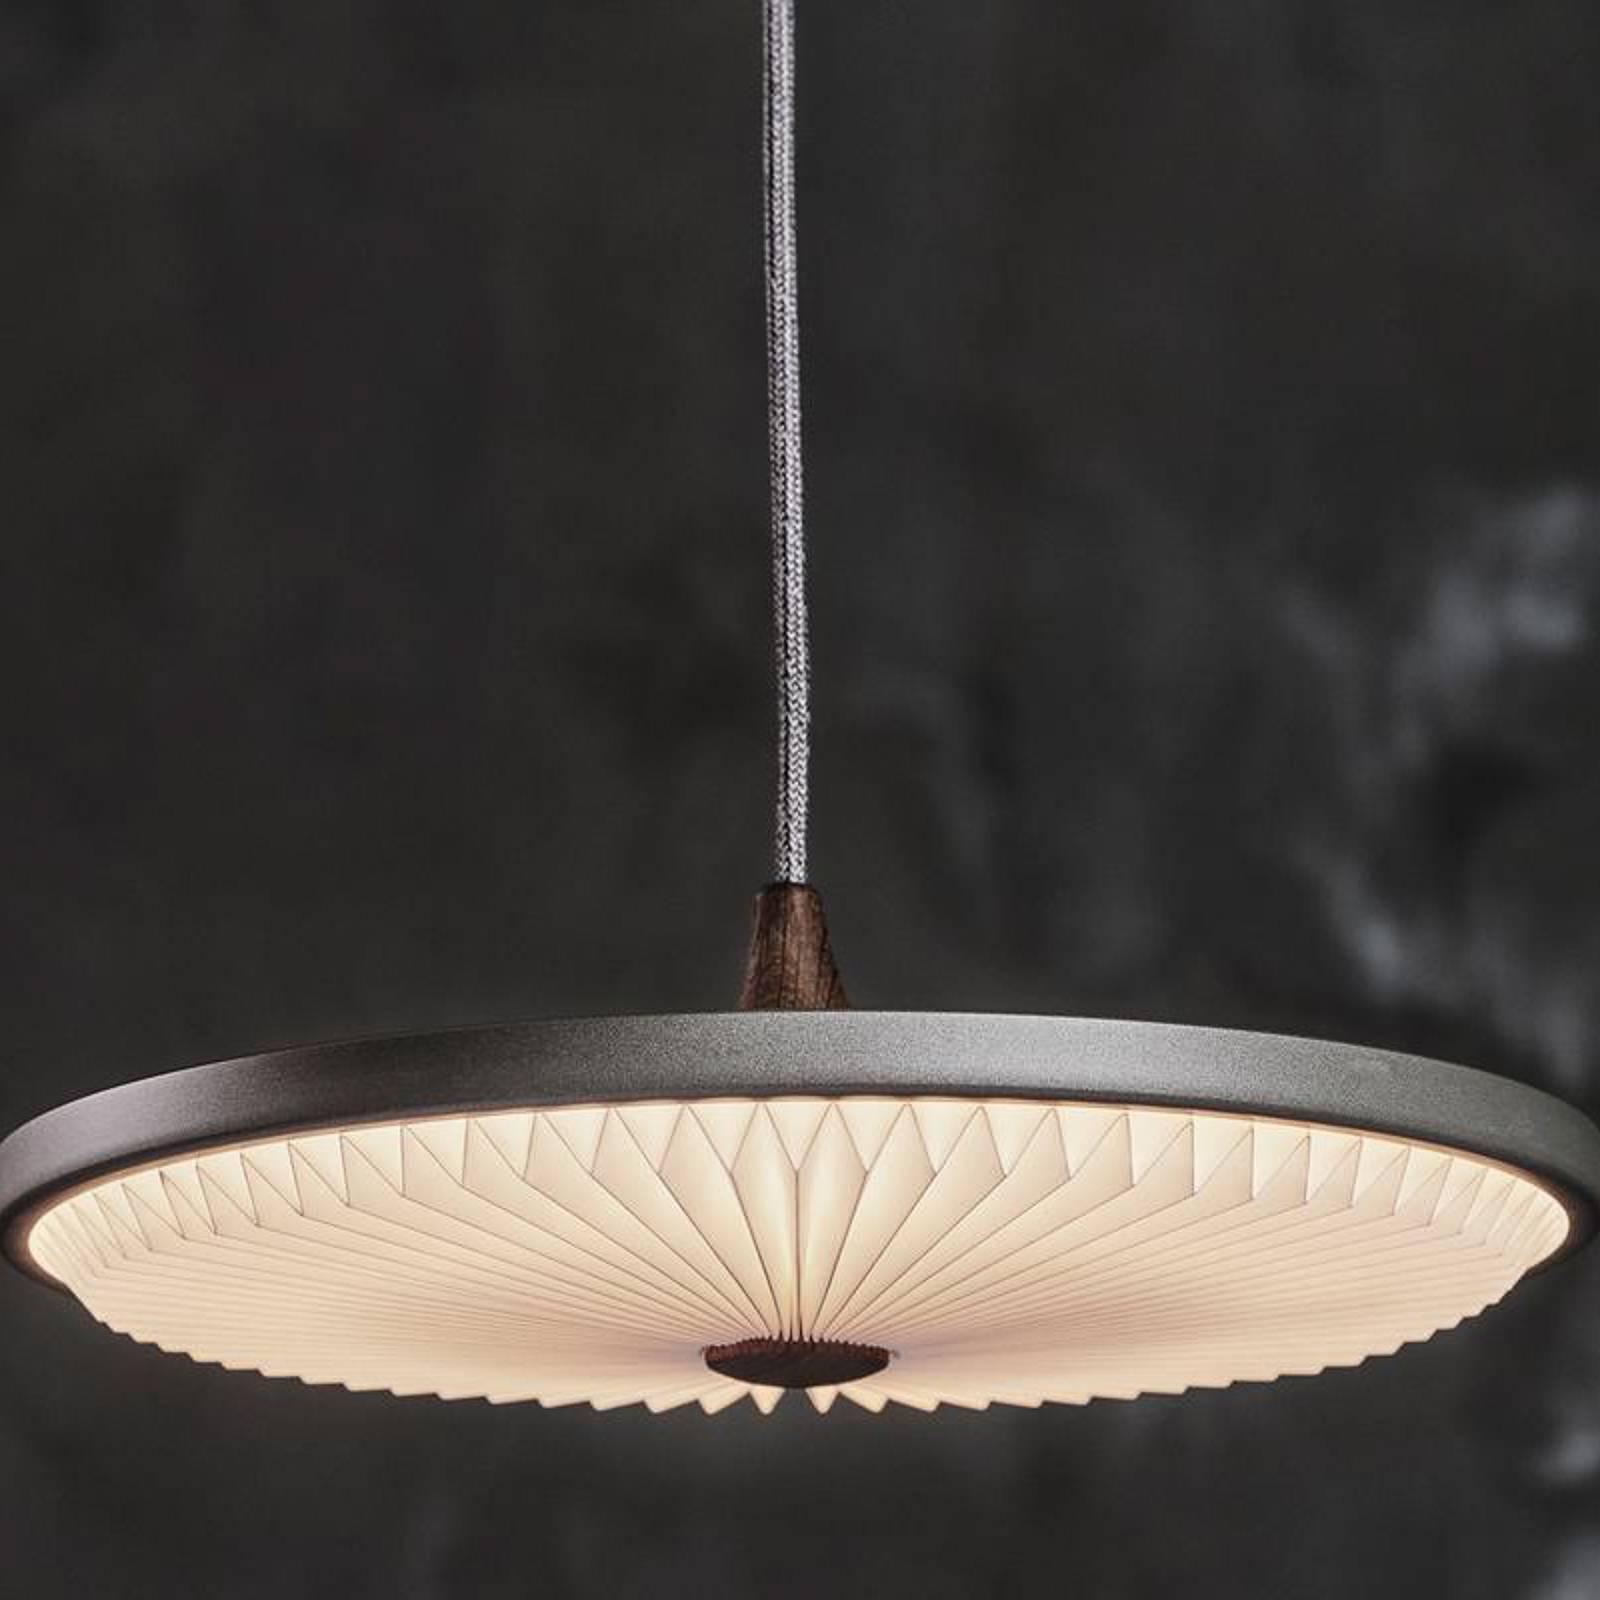 LE KLINT Soleil -LED-riippuvalo tummanharmaa 50 cm